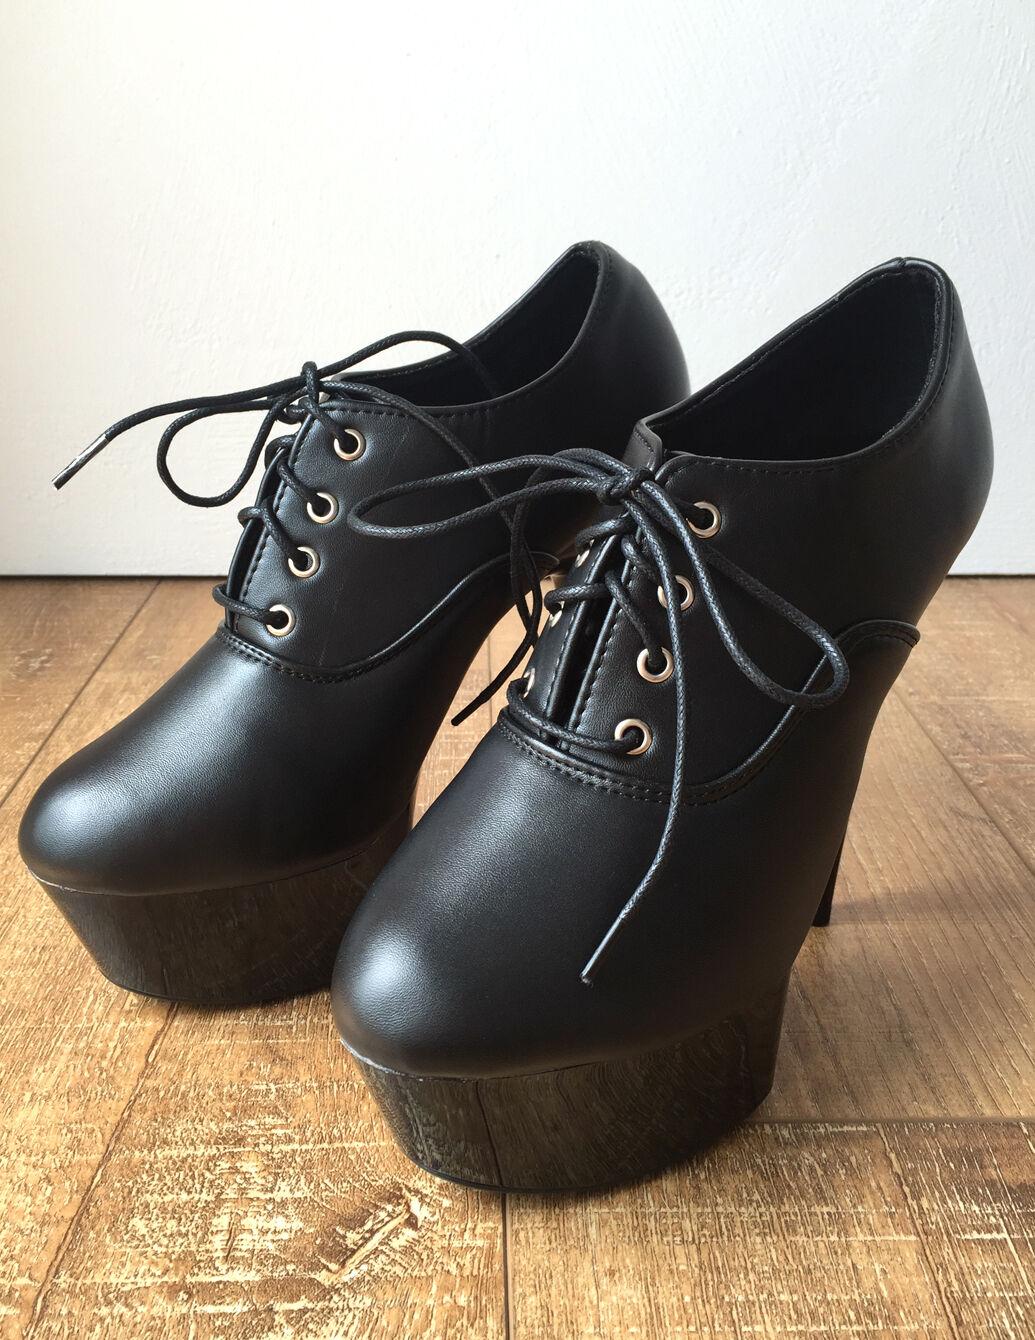 15cm Platform Ankle Oxford Bootie Extreme Hi Heel Goth Runway Custom Color